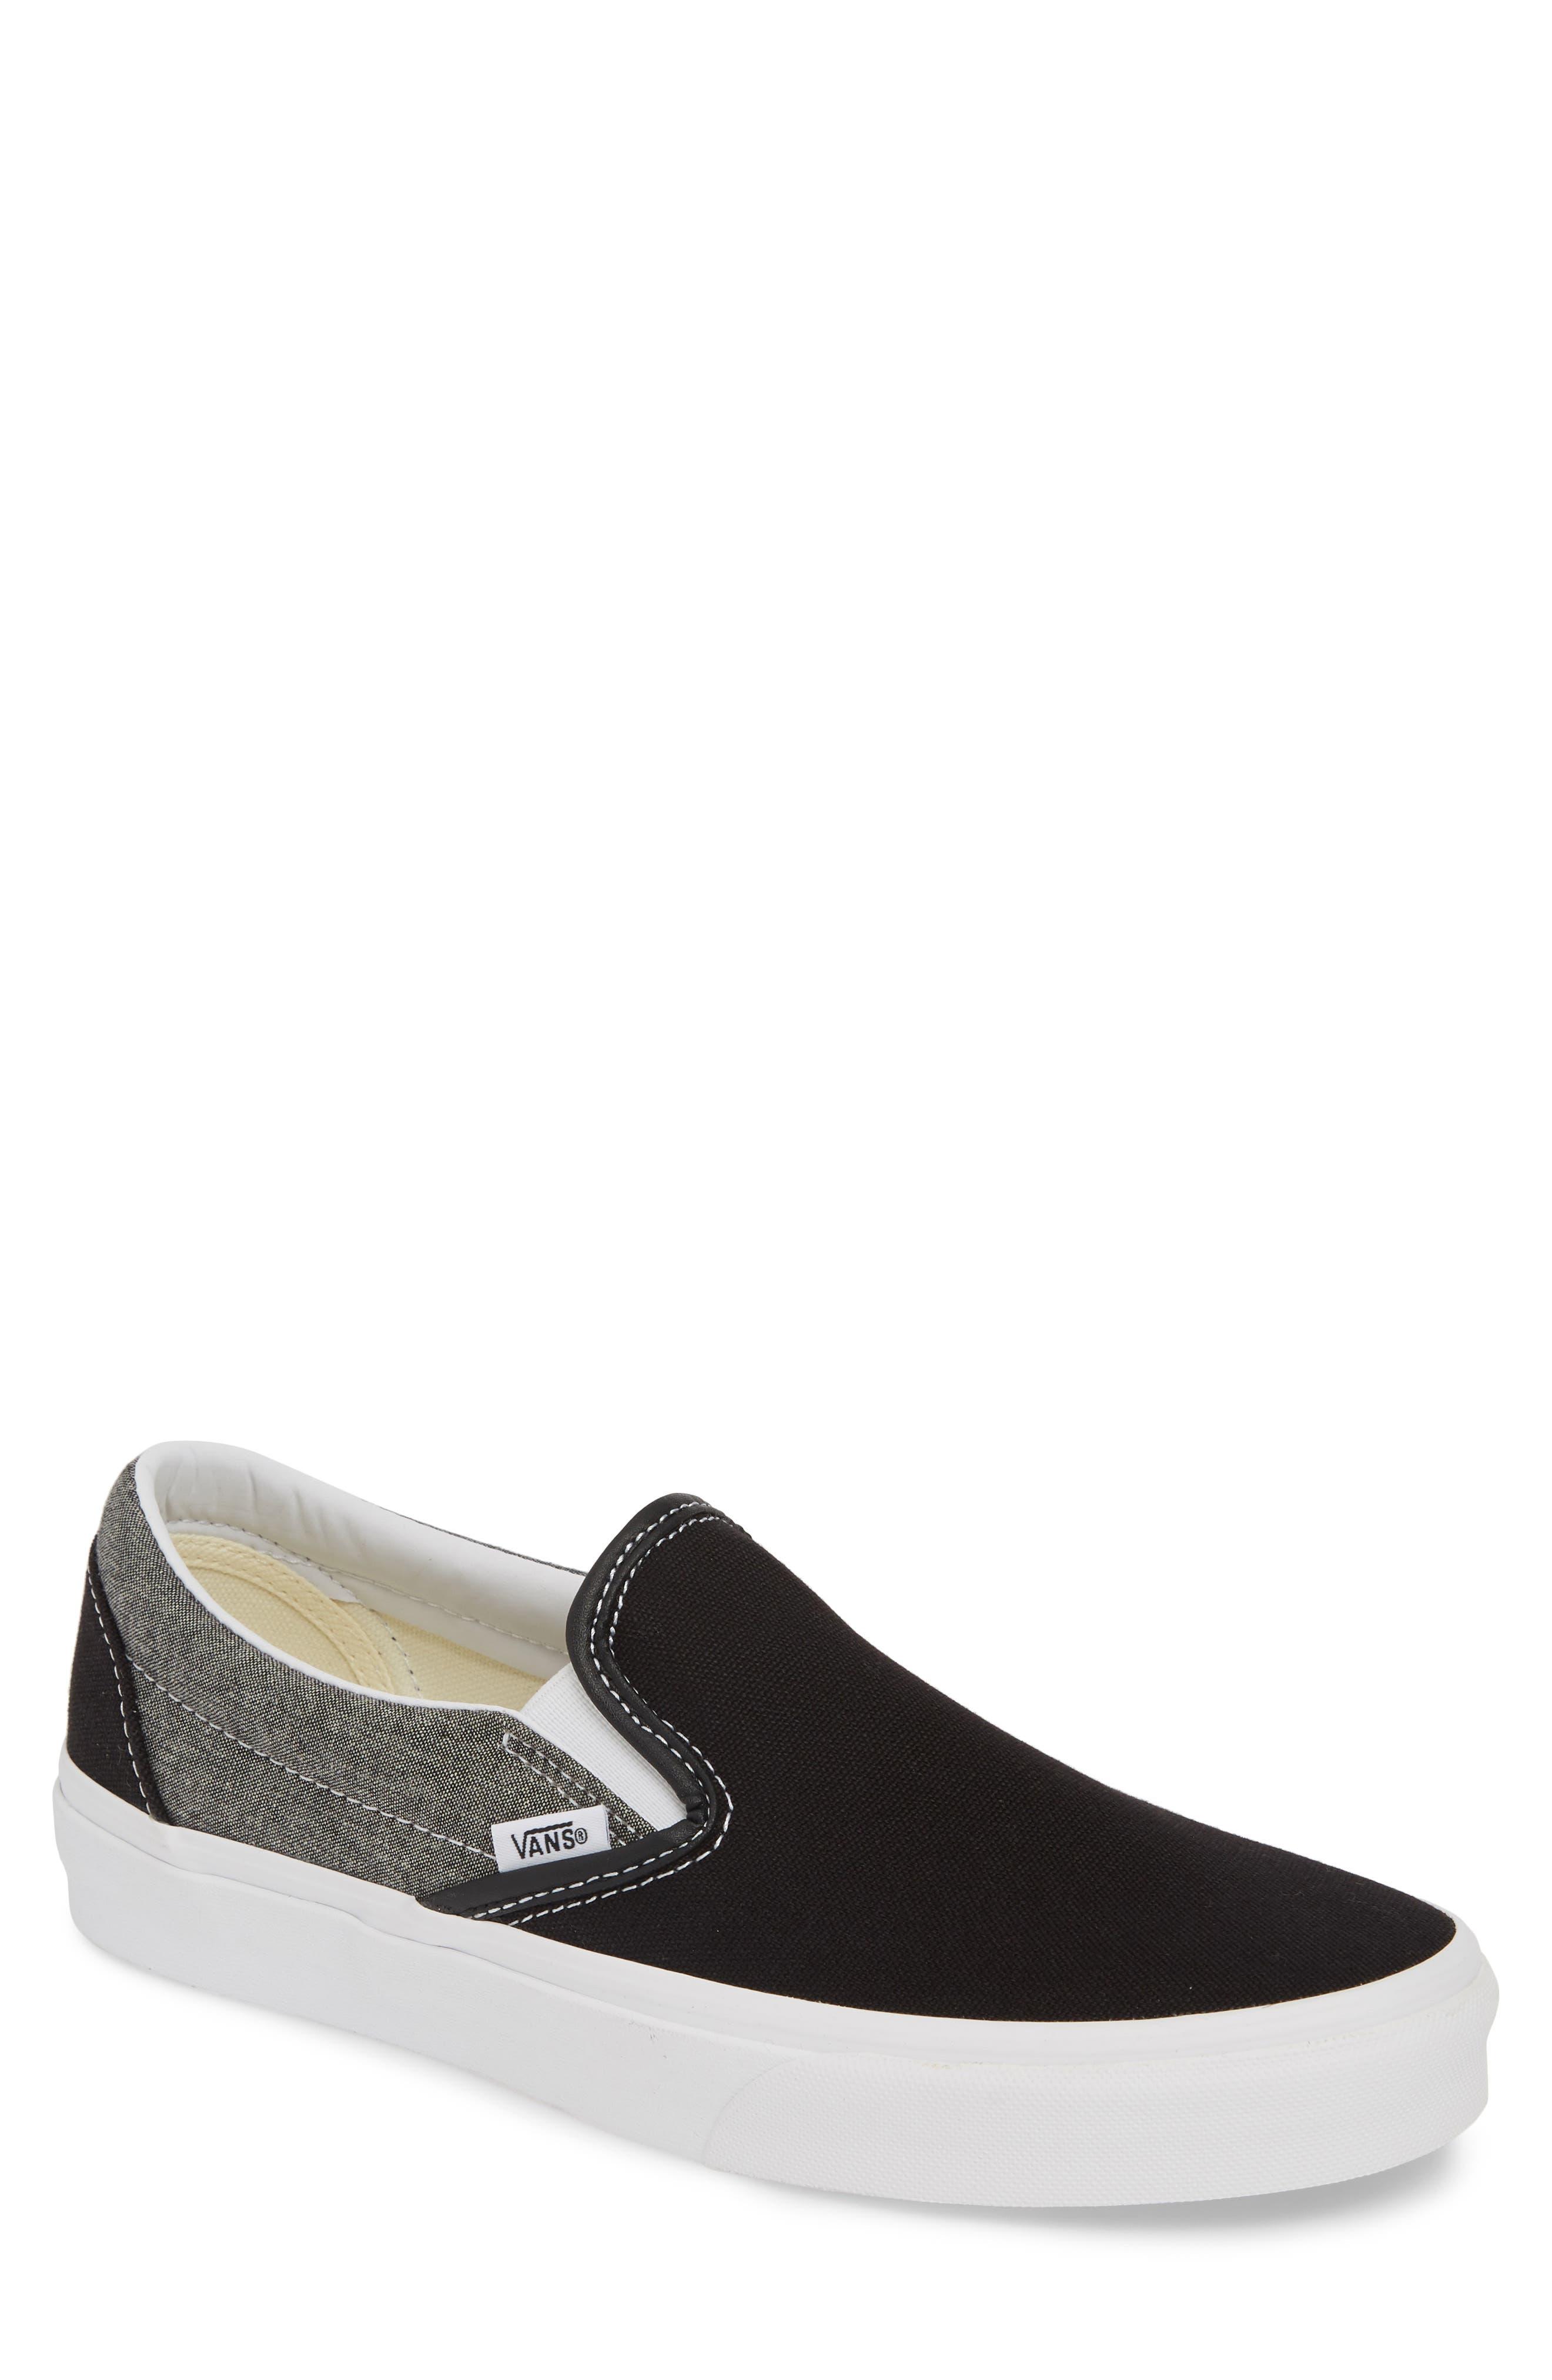 VANS 'Classic' Slip-On Sneaker, Main, color, CANVAS BLACK/ WHITE CHAMBRAY